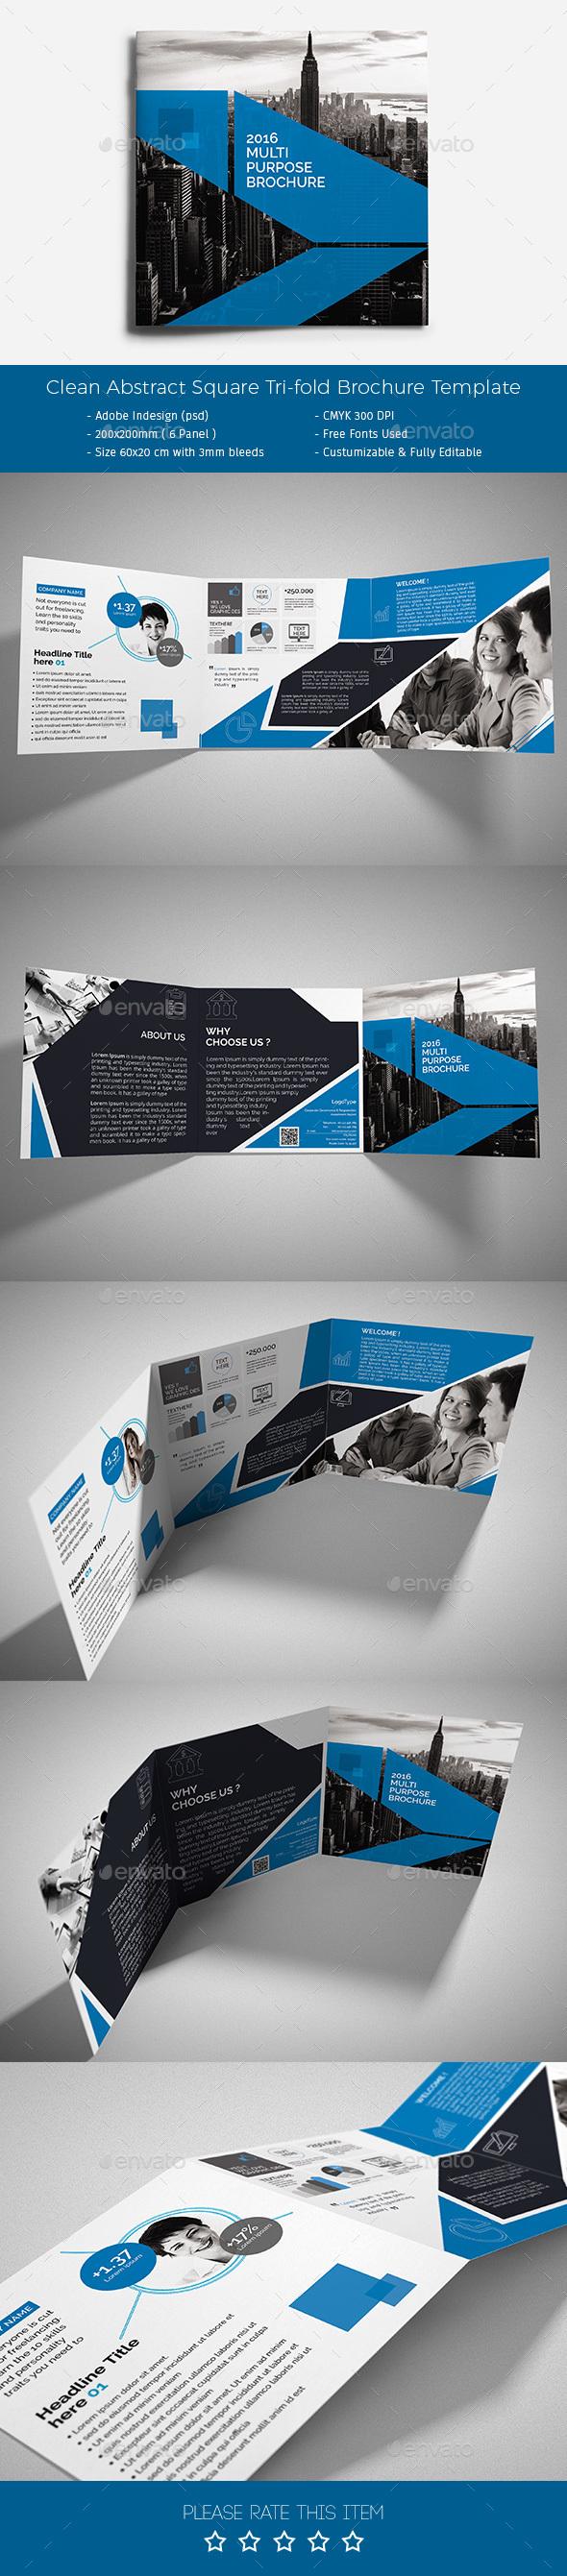 Corporate Tri-fold Square Brochure 04 - Corporate Brochures